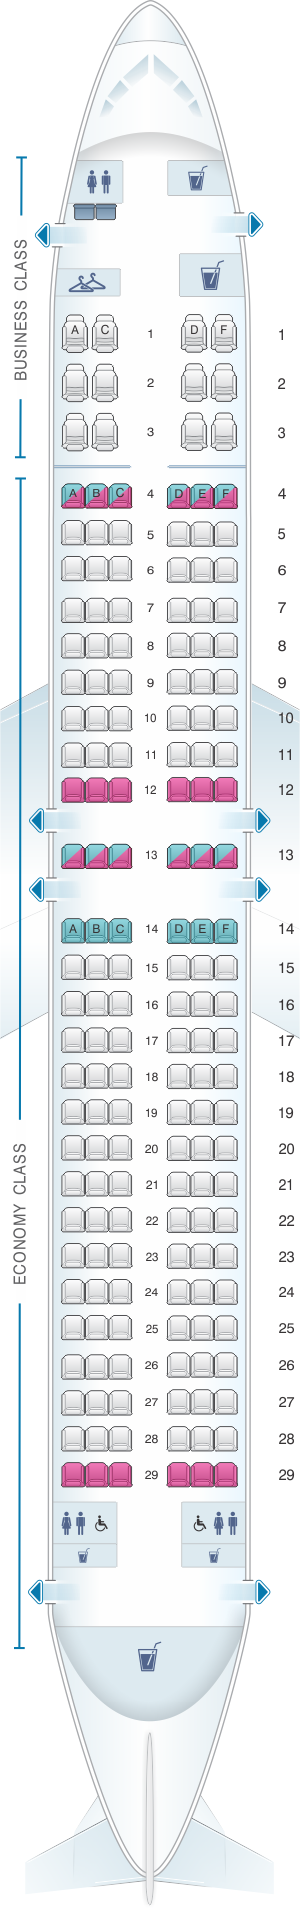 Seat Map Qantas Airways Boeing B737 800 168PAX | SeatMaestro